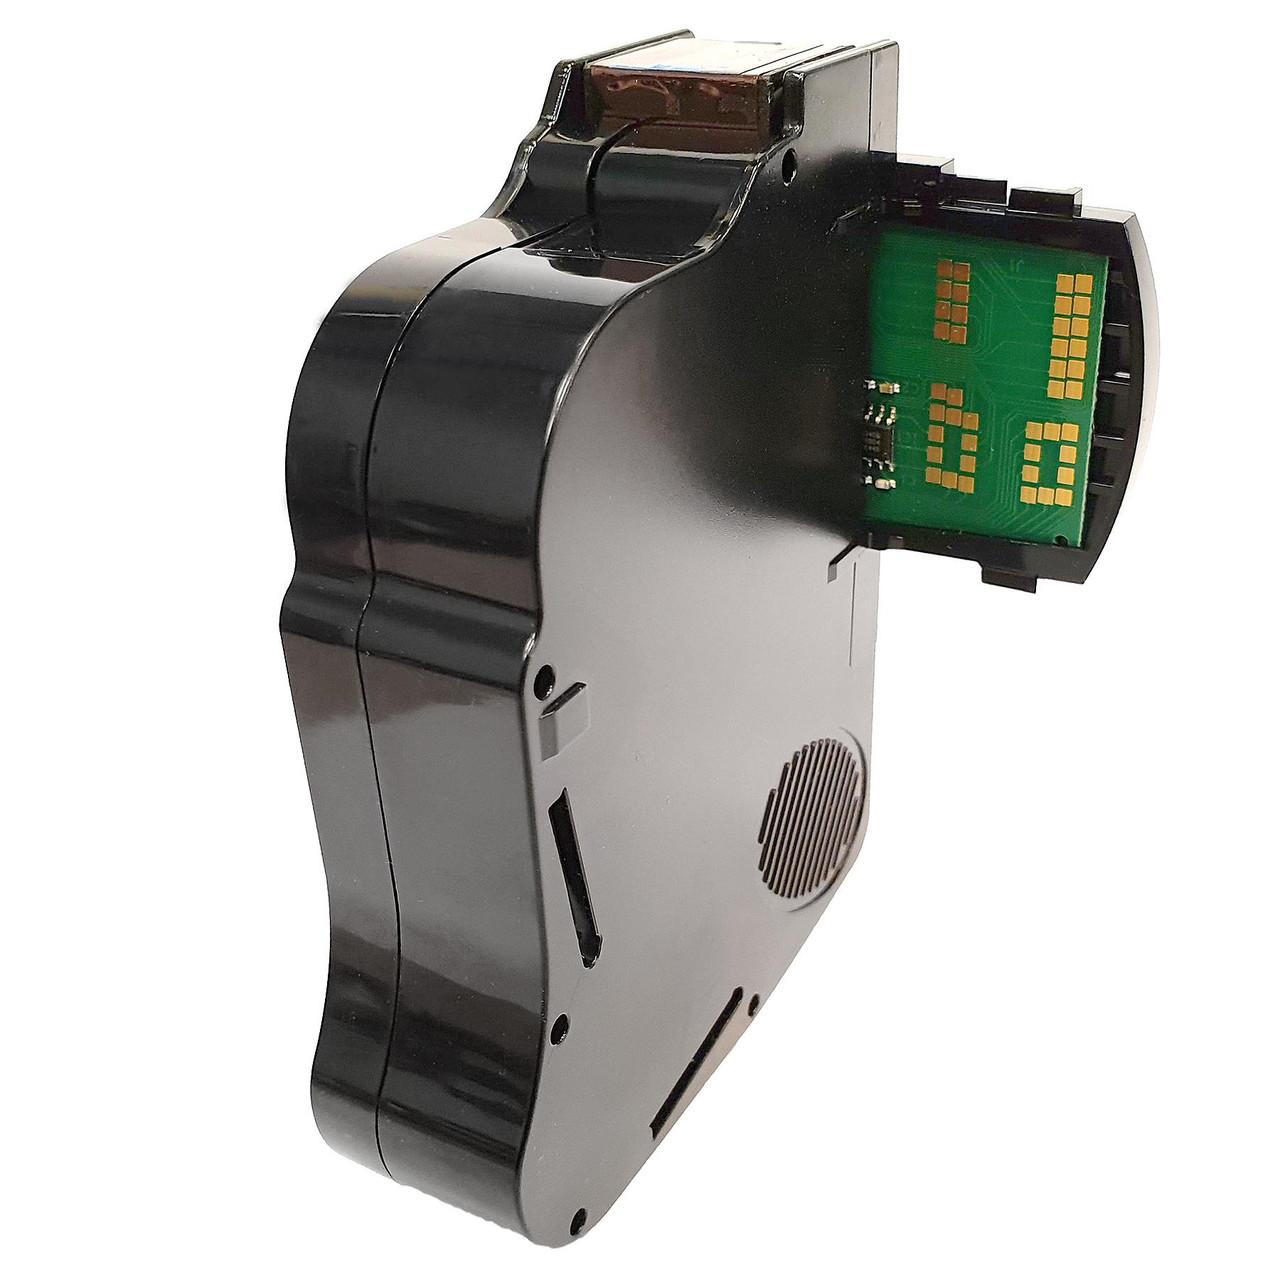 Original NEOPOST / QUADIENT IS200, IS220, IS240, IS280 Franking Ink Cartridge